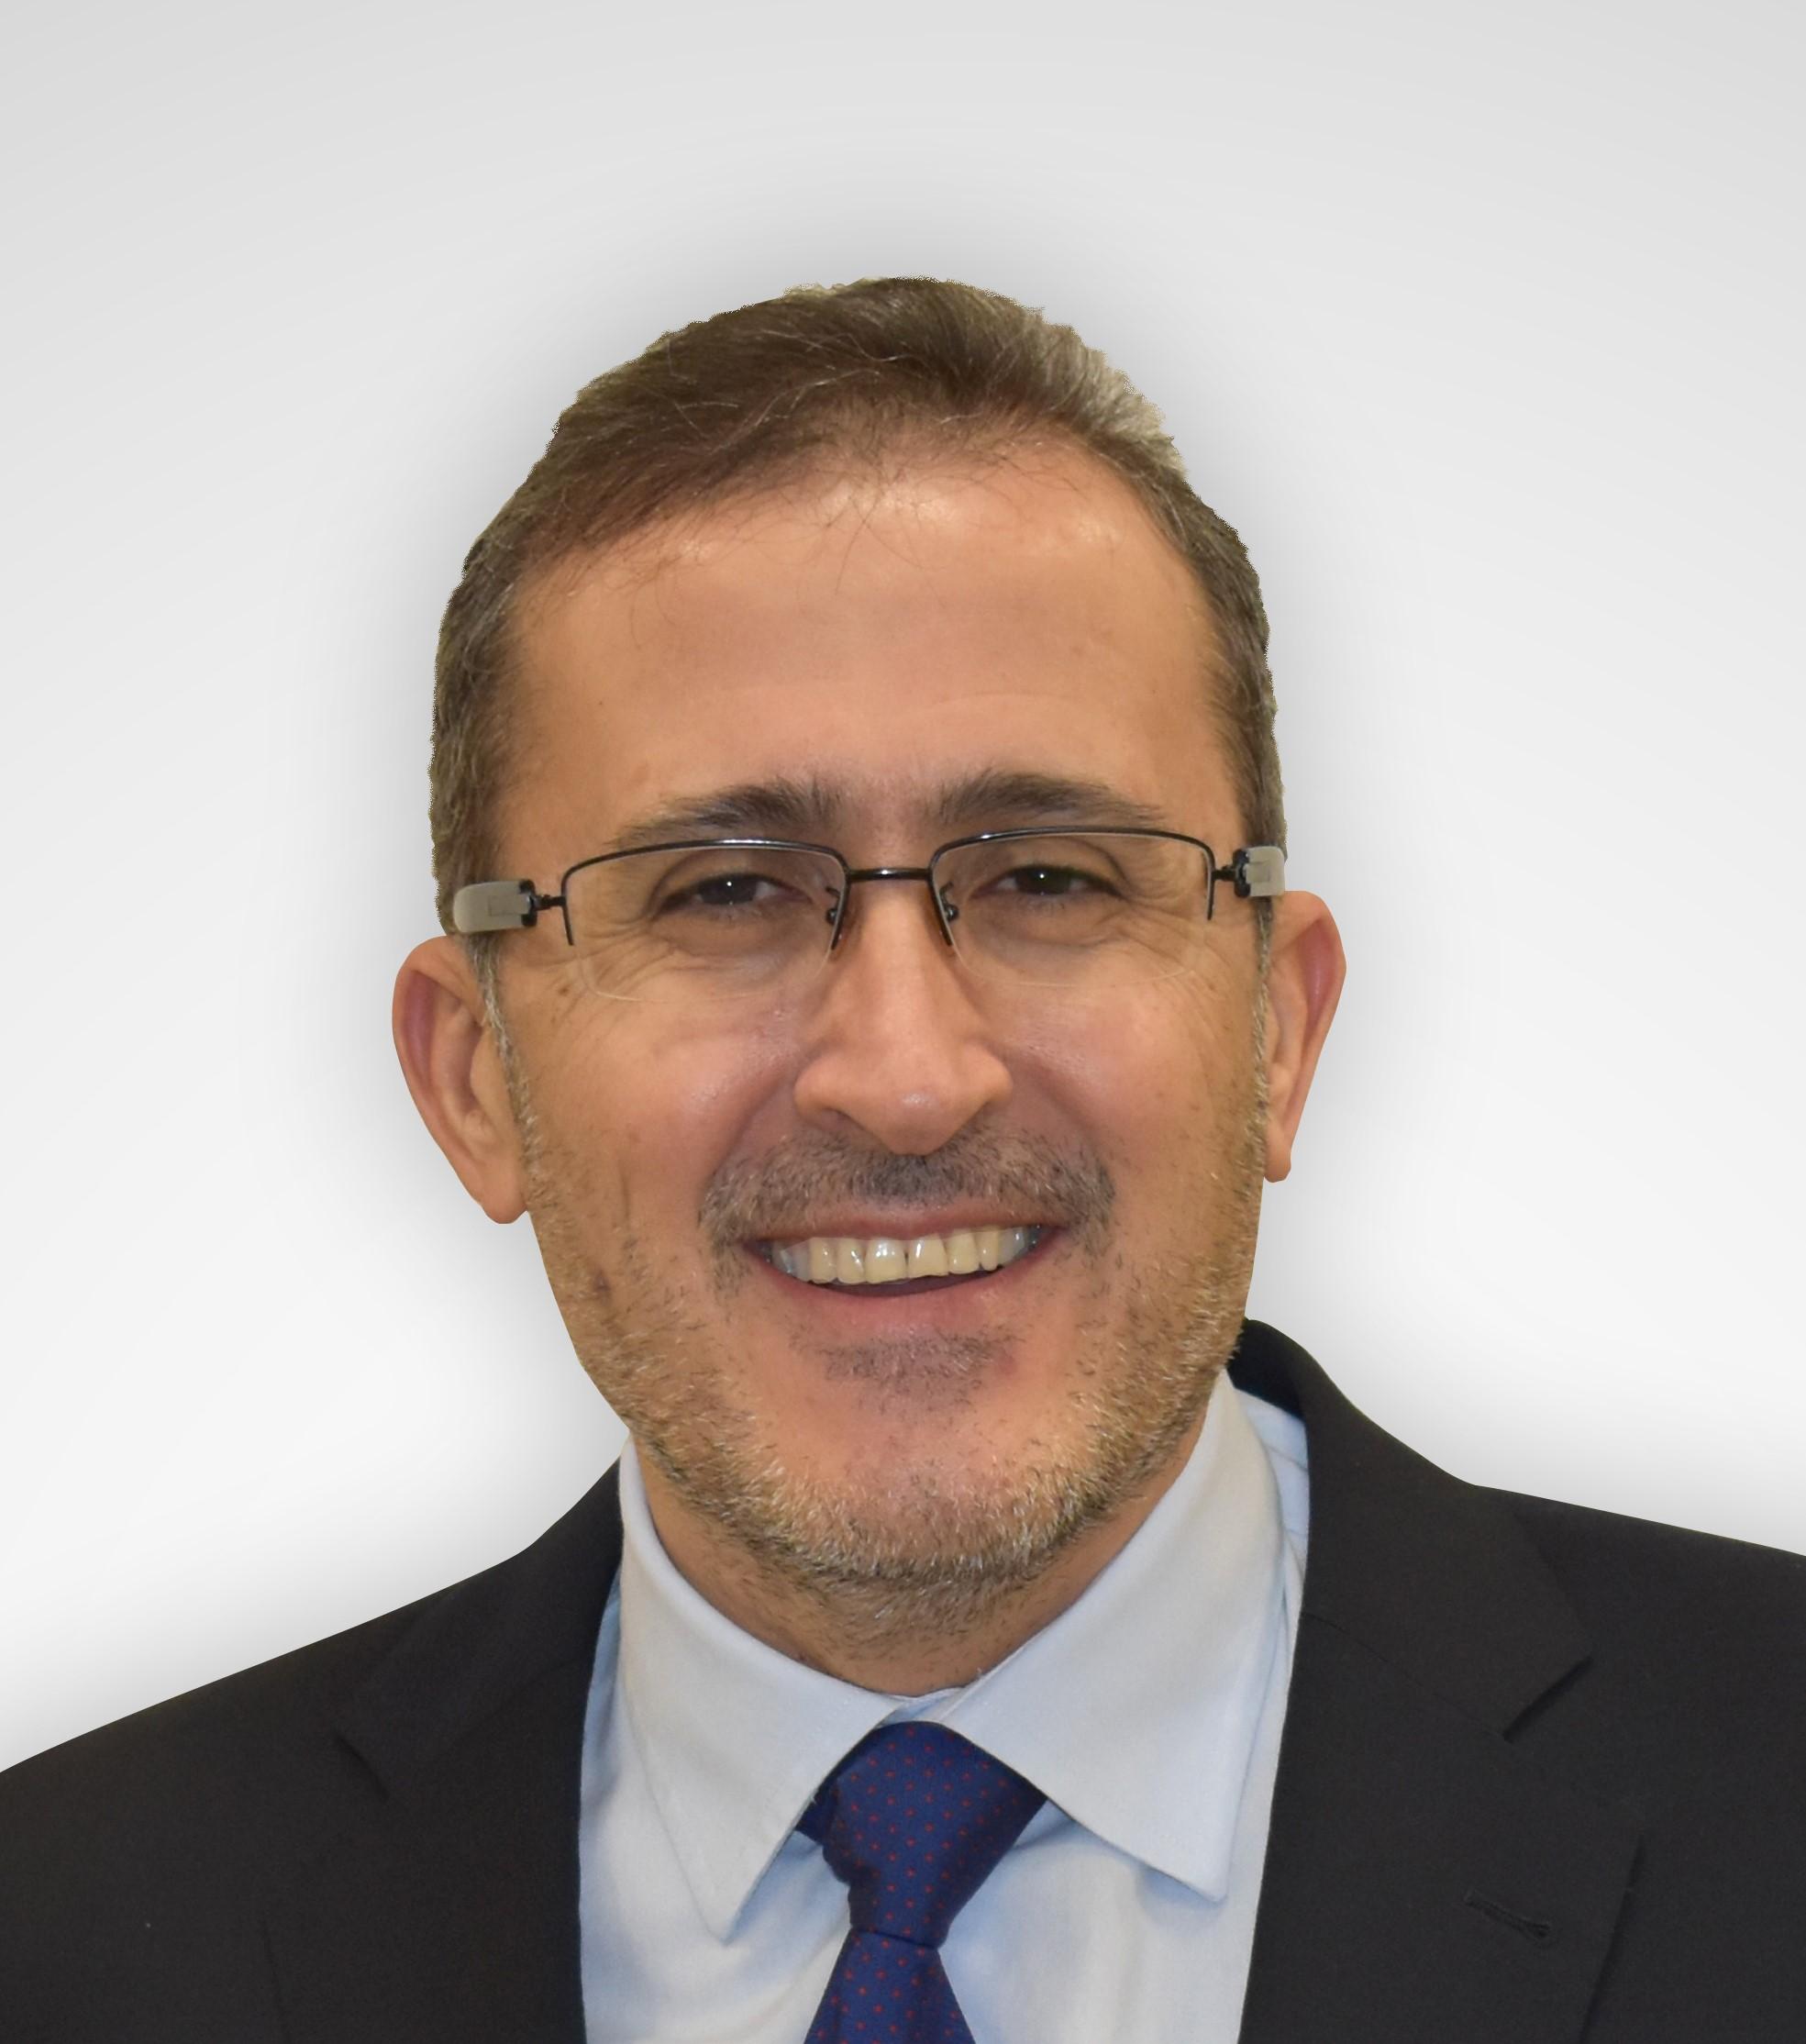 Javier Villacampa